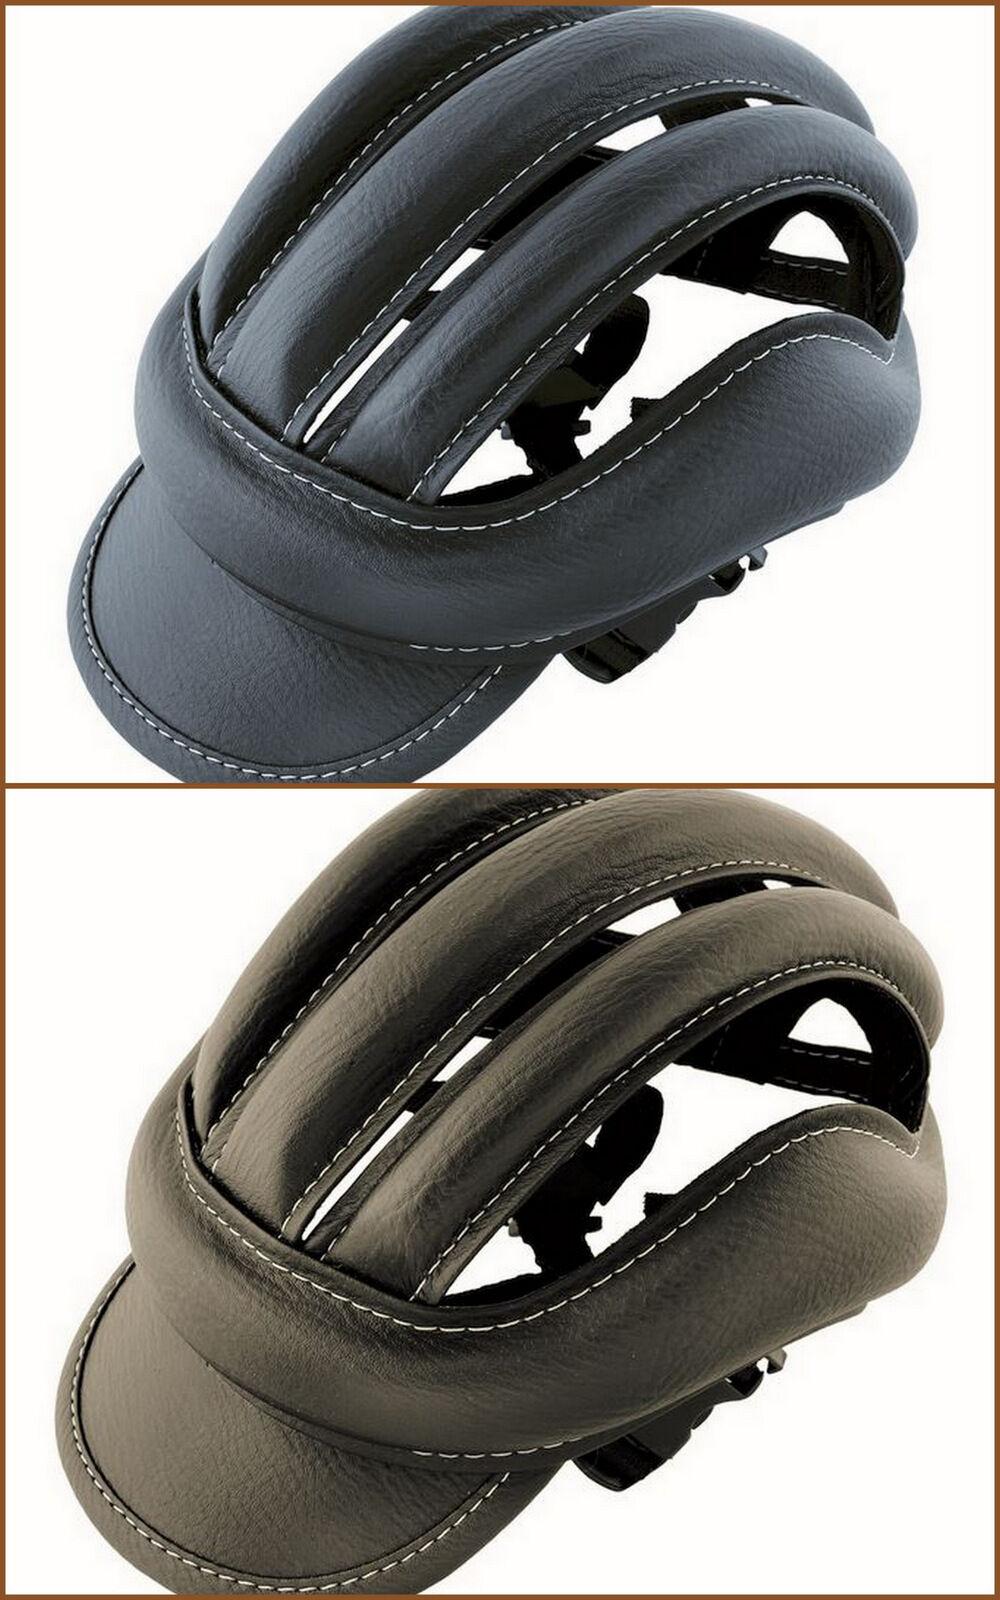 Casco bici copricapo vintage epoca finta pelle eroica bike helmet black brown